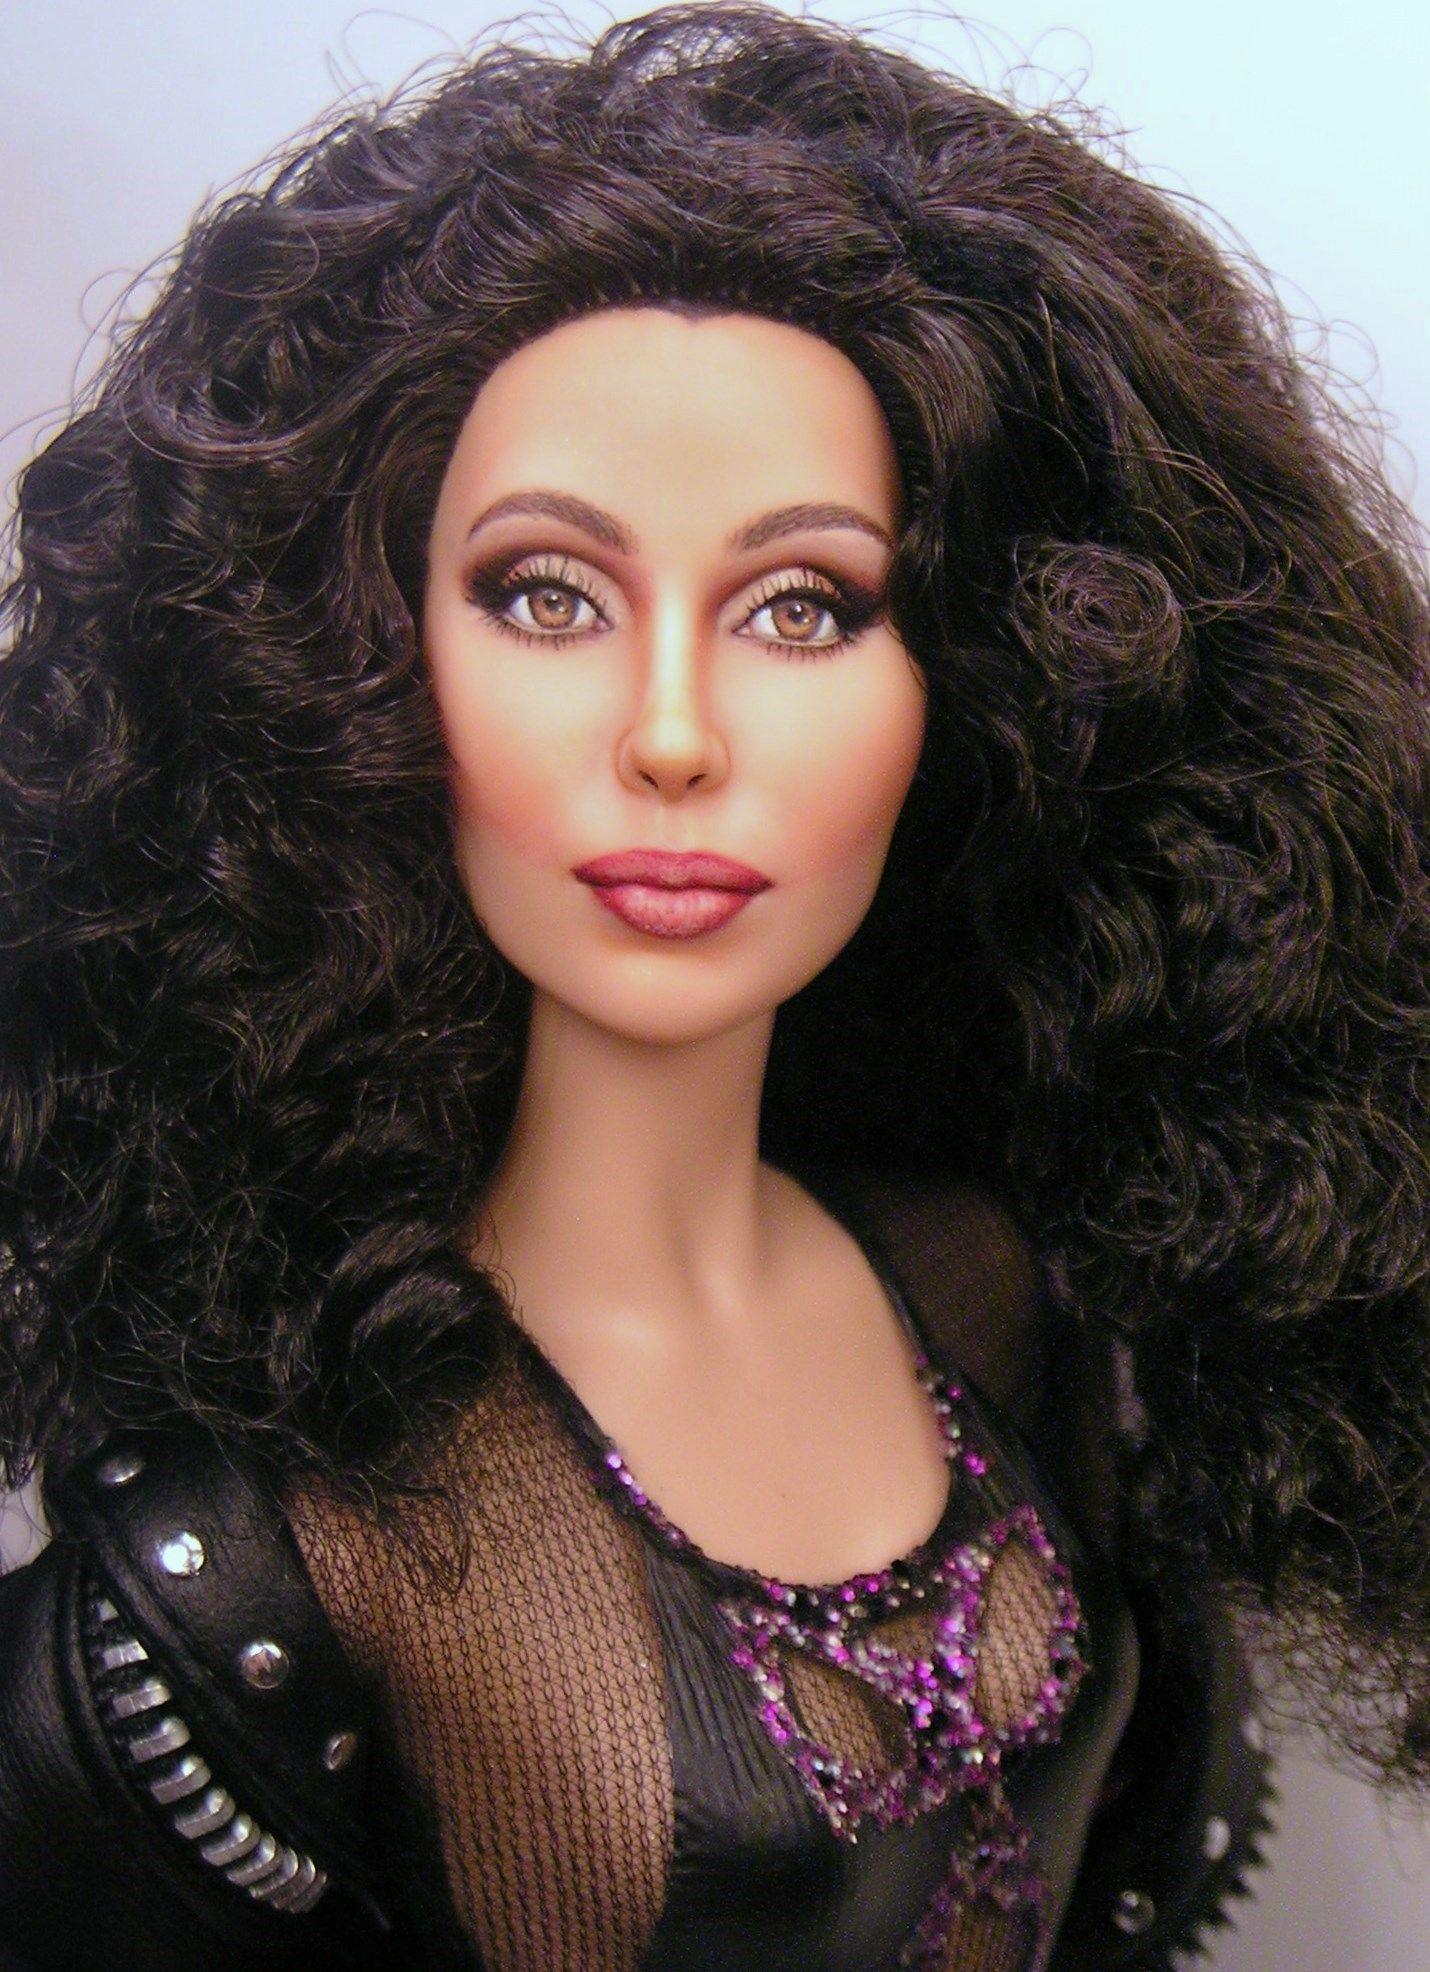 Celebrity Dolls By Noel Cruz (45 Photos) - FunCage